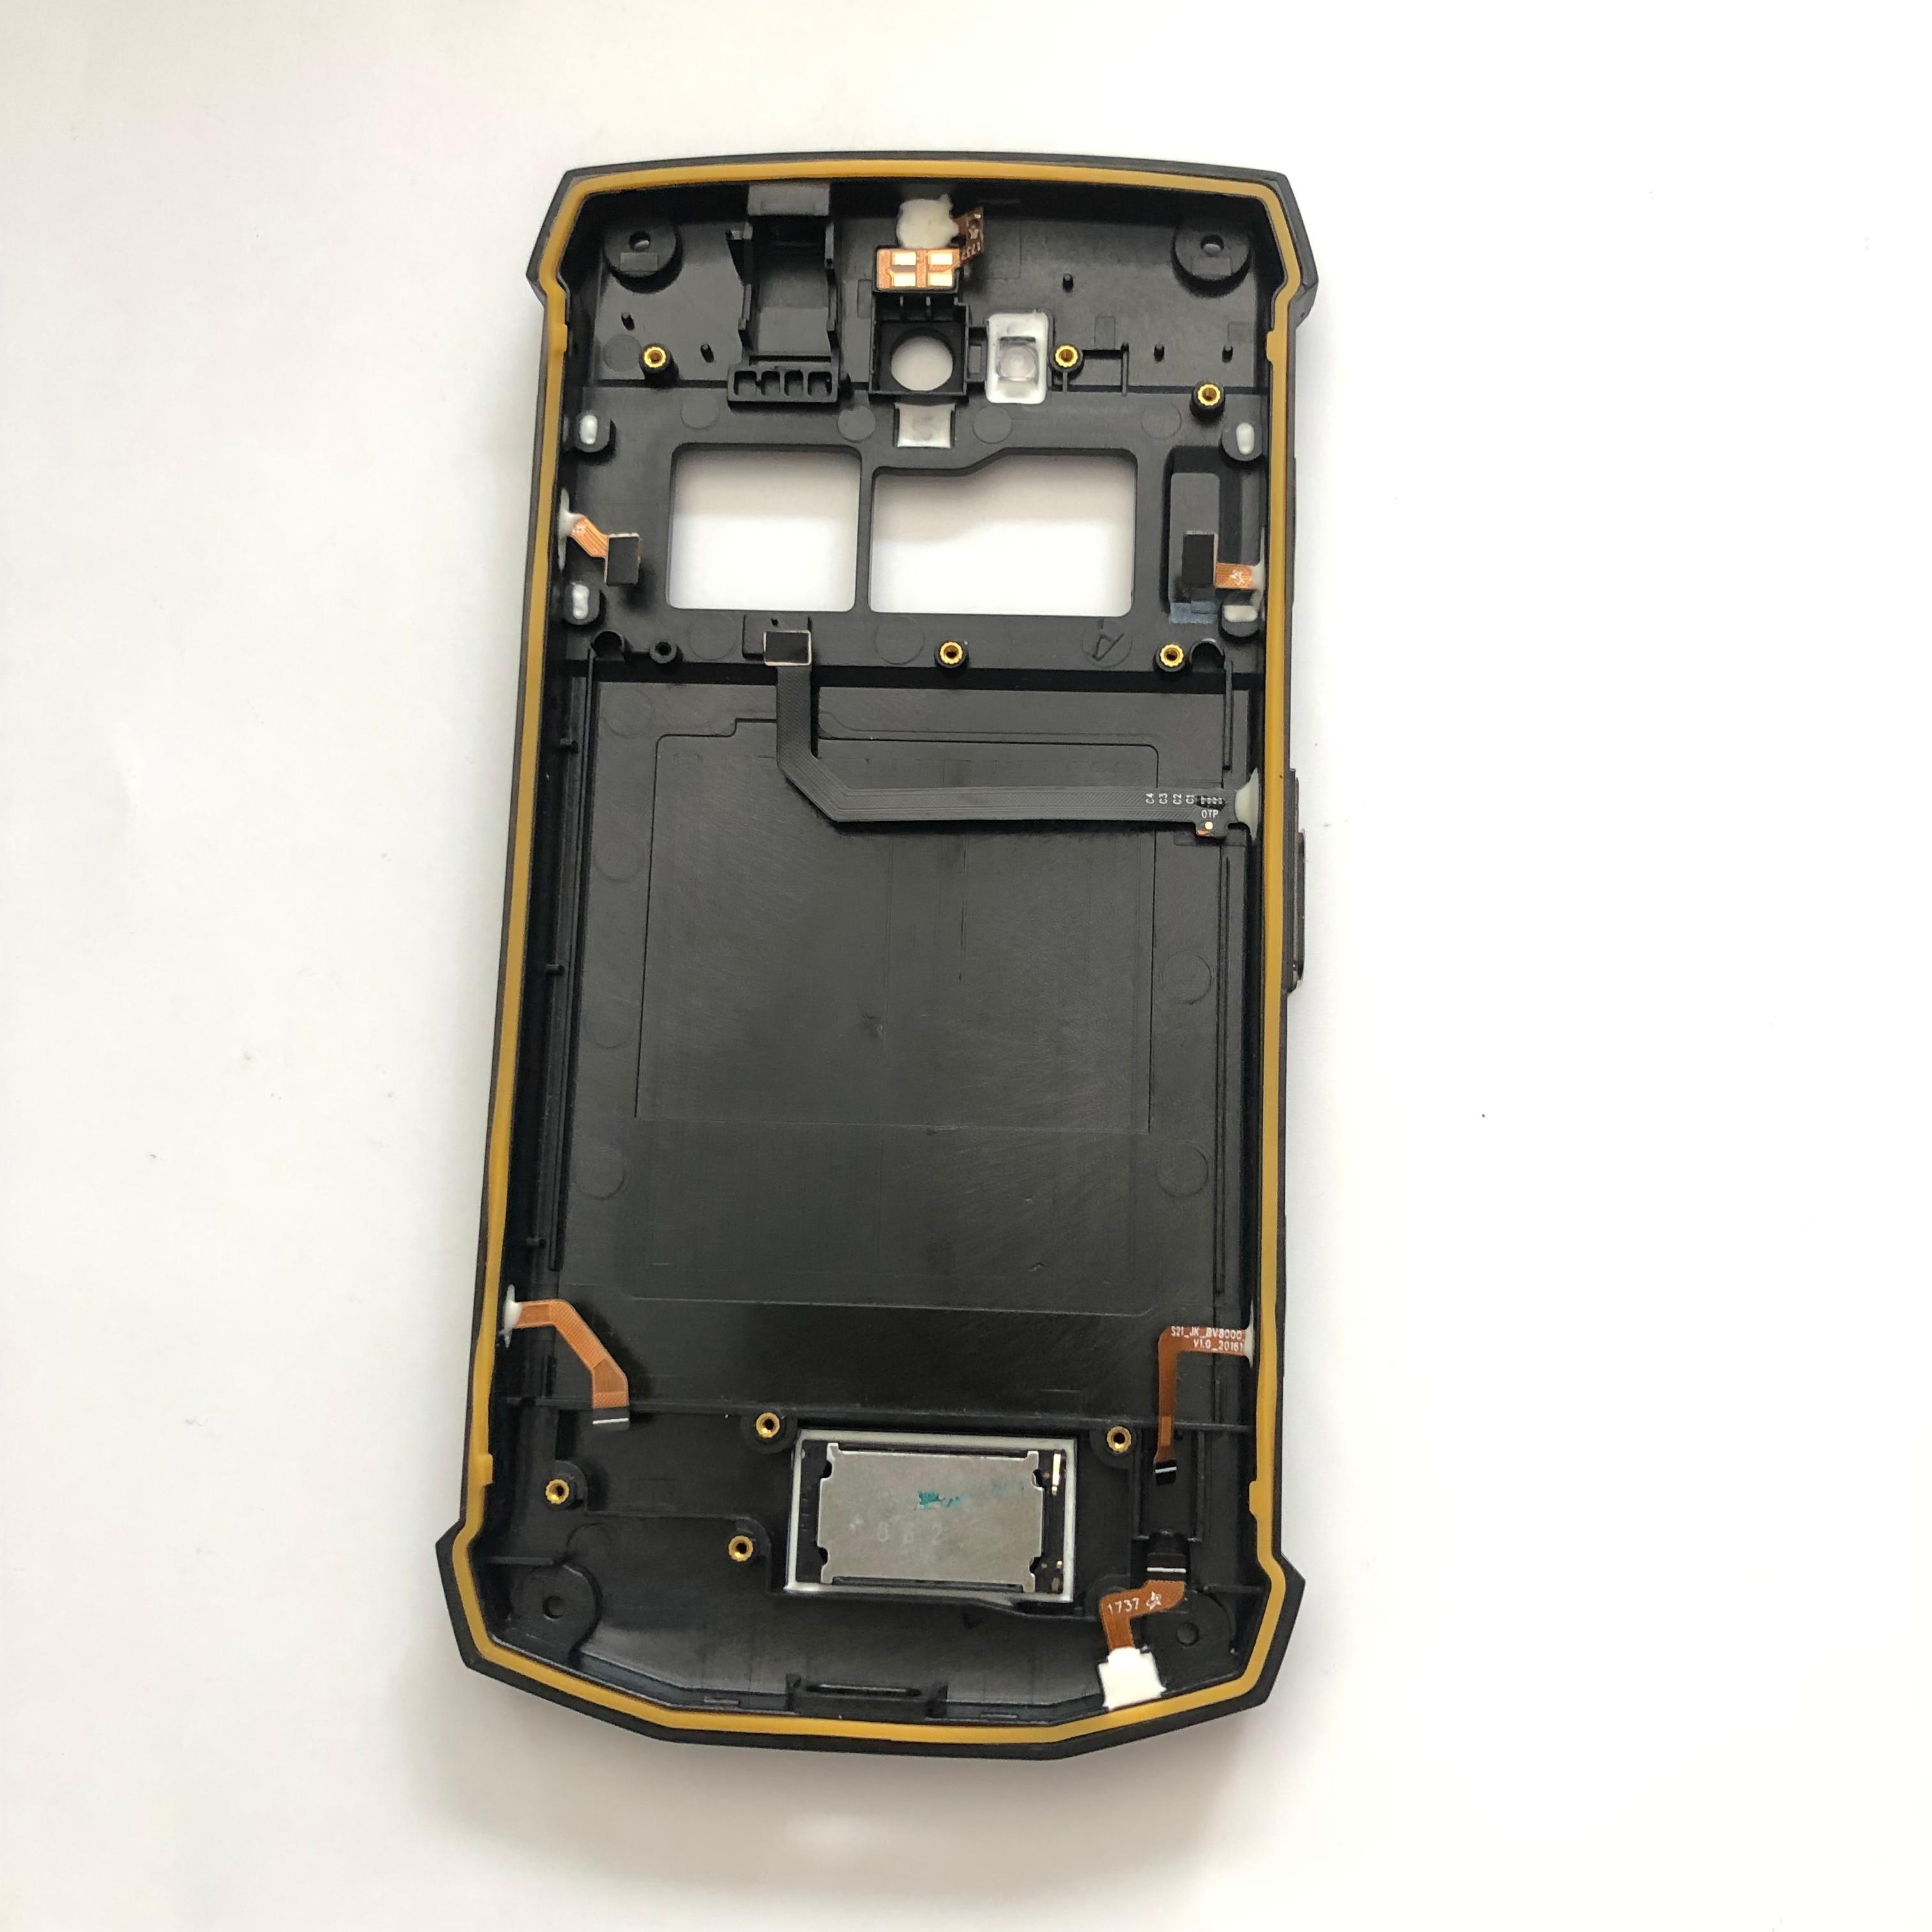 Blackview BV8000 Pro New Original Protective Battery Case Cover Back Shell For Blackview BV8000 Pro MT6757 5.0 Inch Smartphone